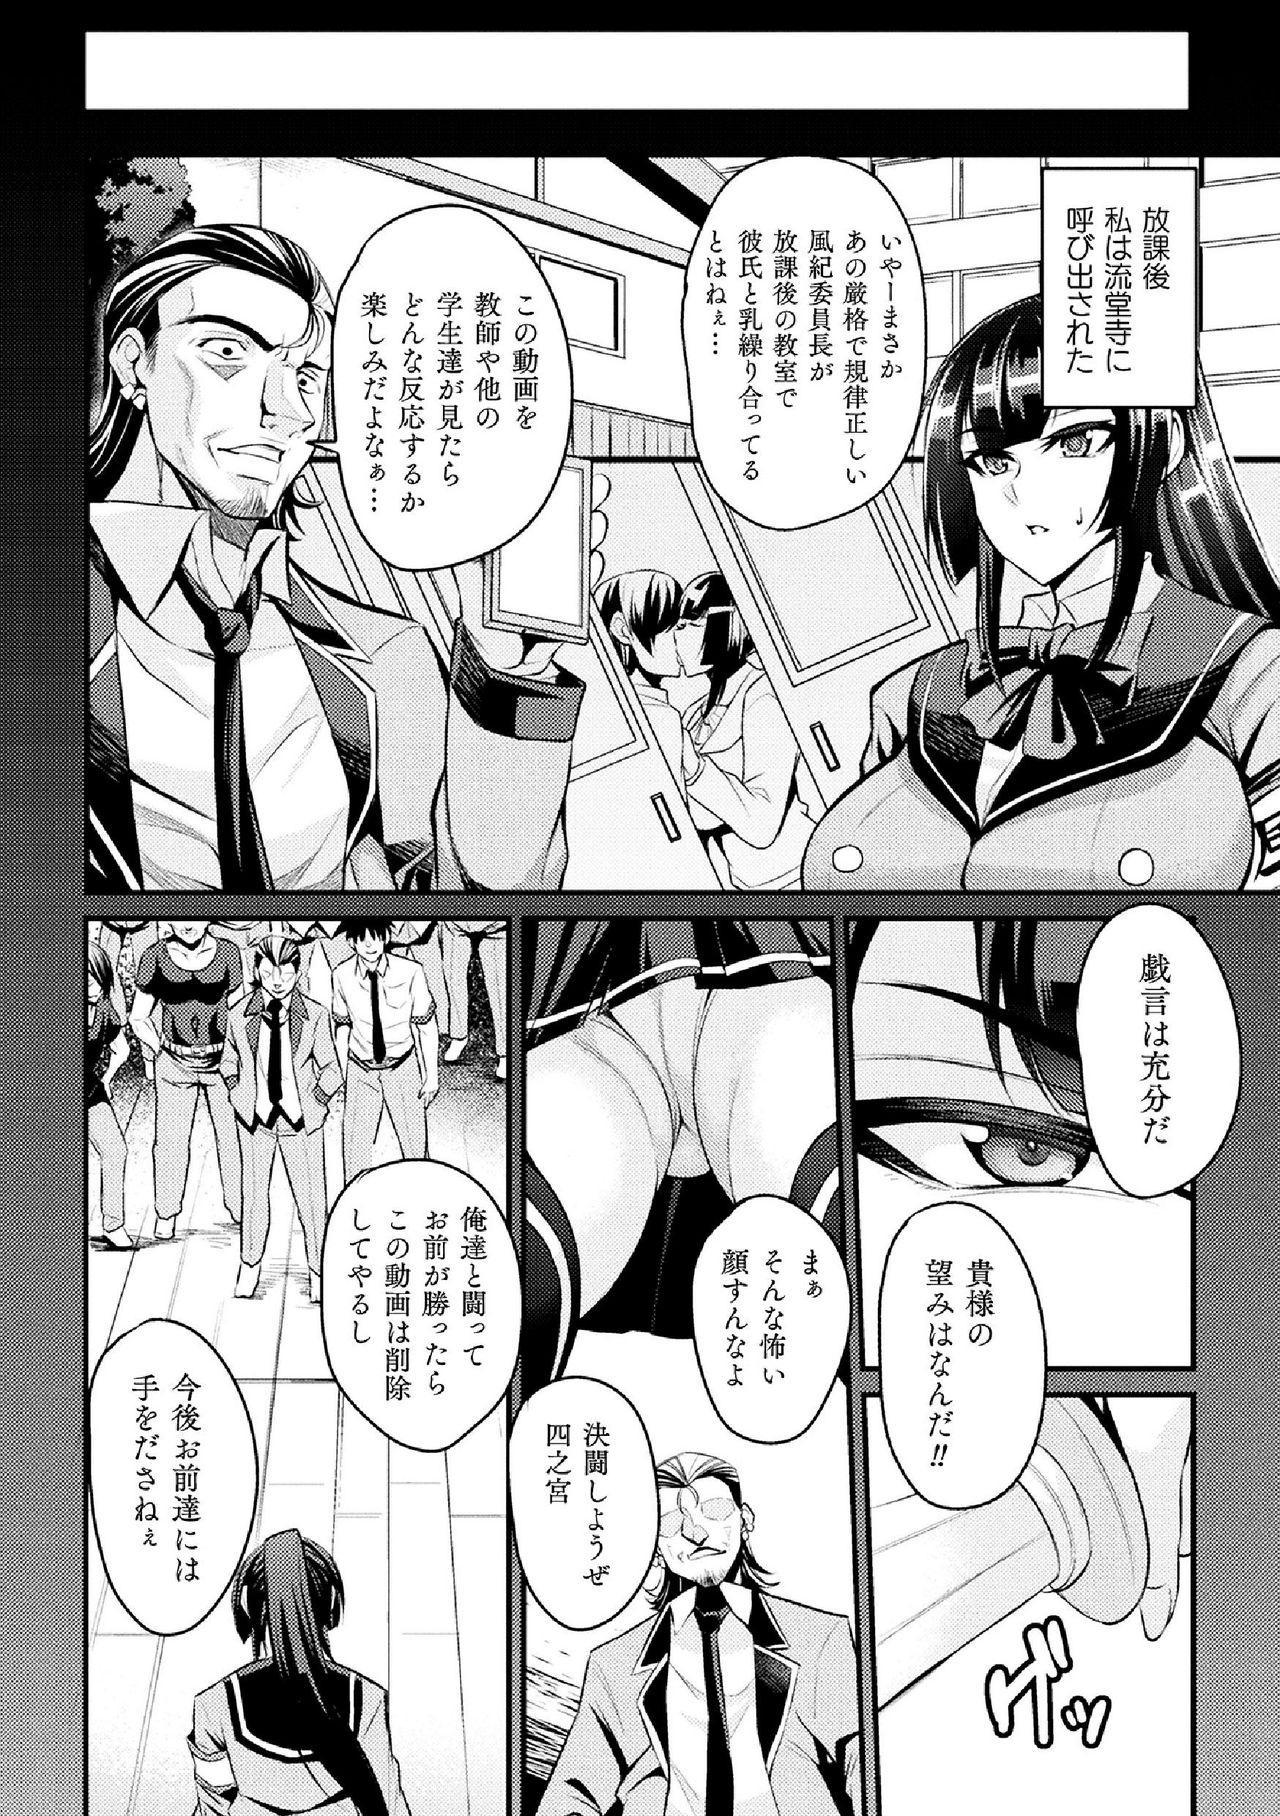 2D Comic Magazine Namaiki Onna ni HaraPun Seisai! Vol. 2 3